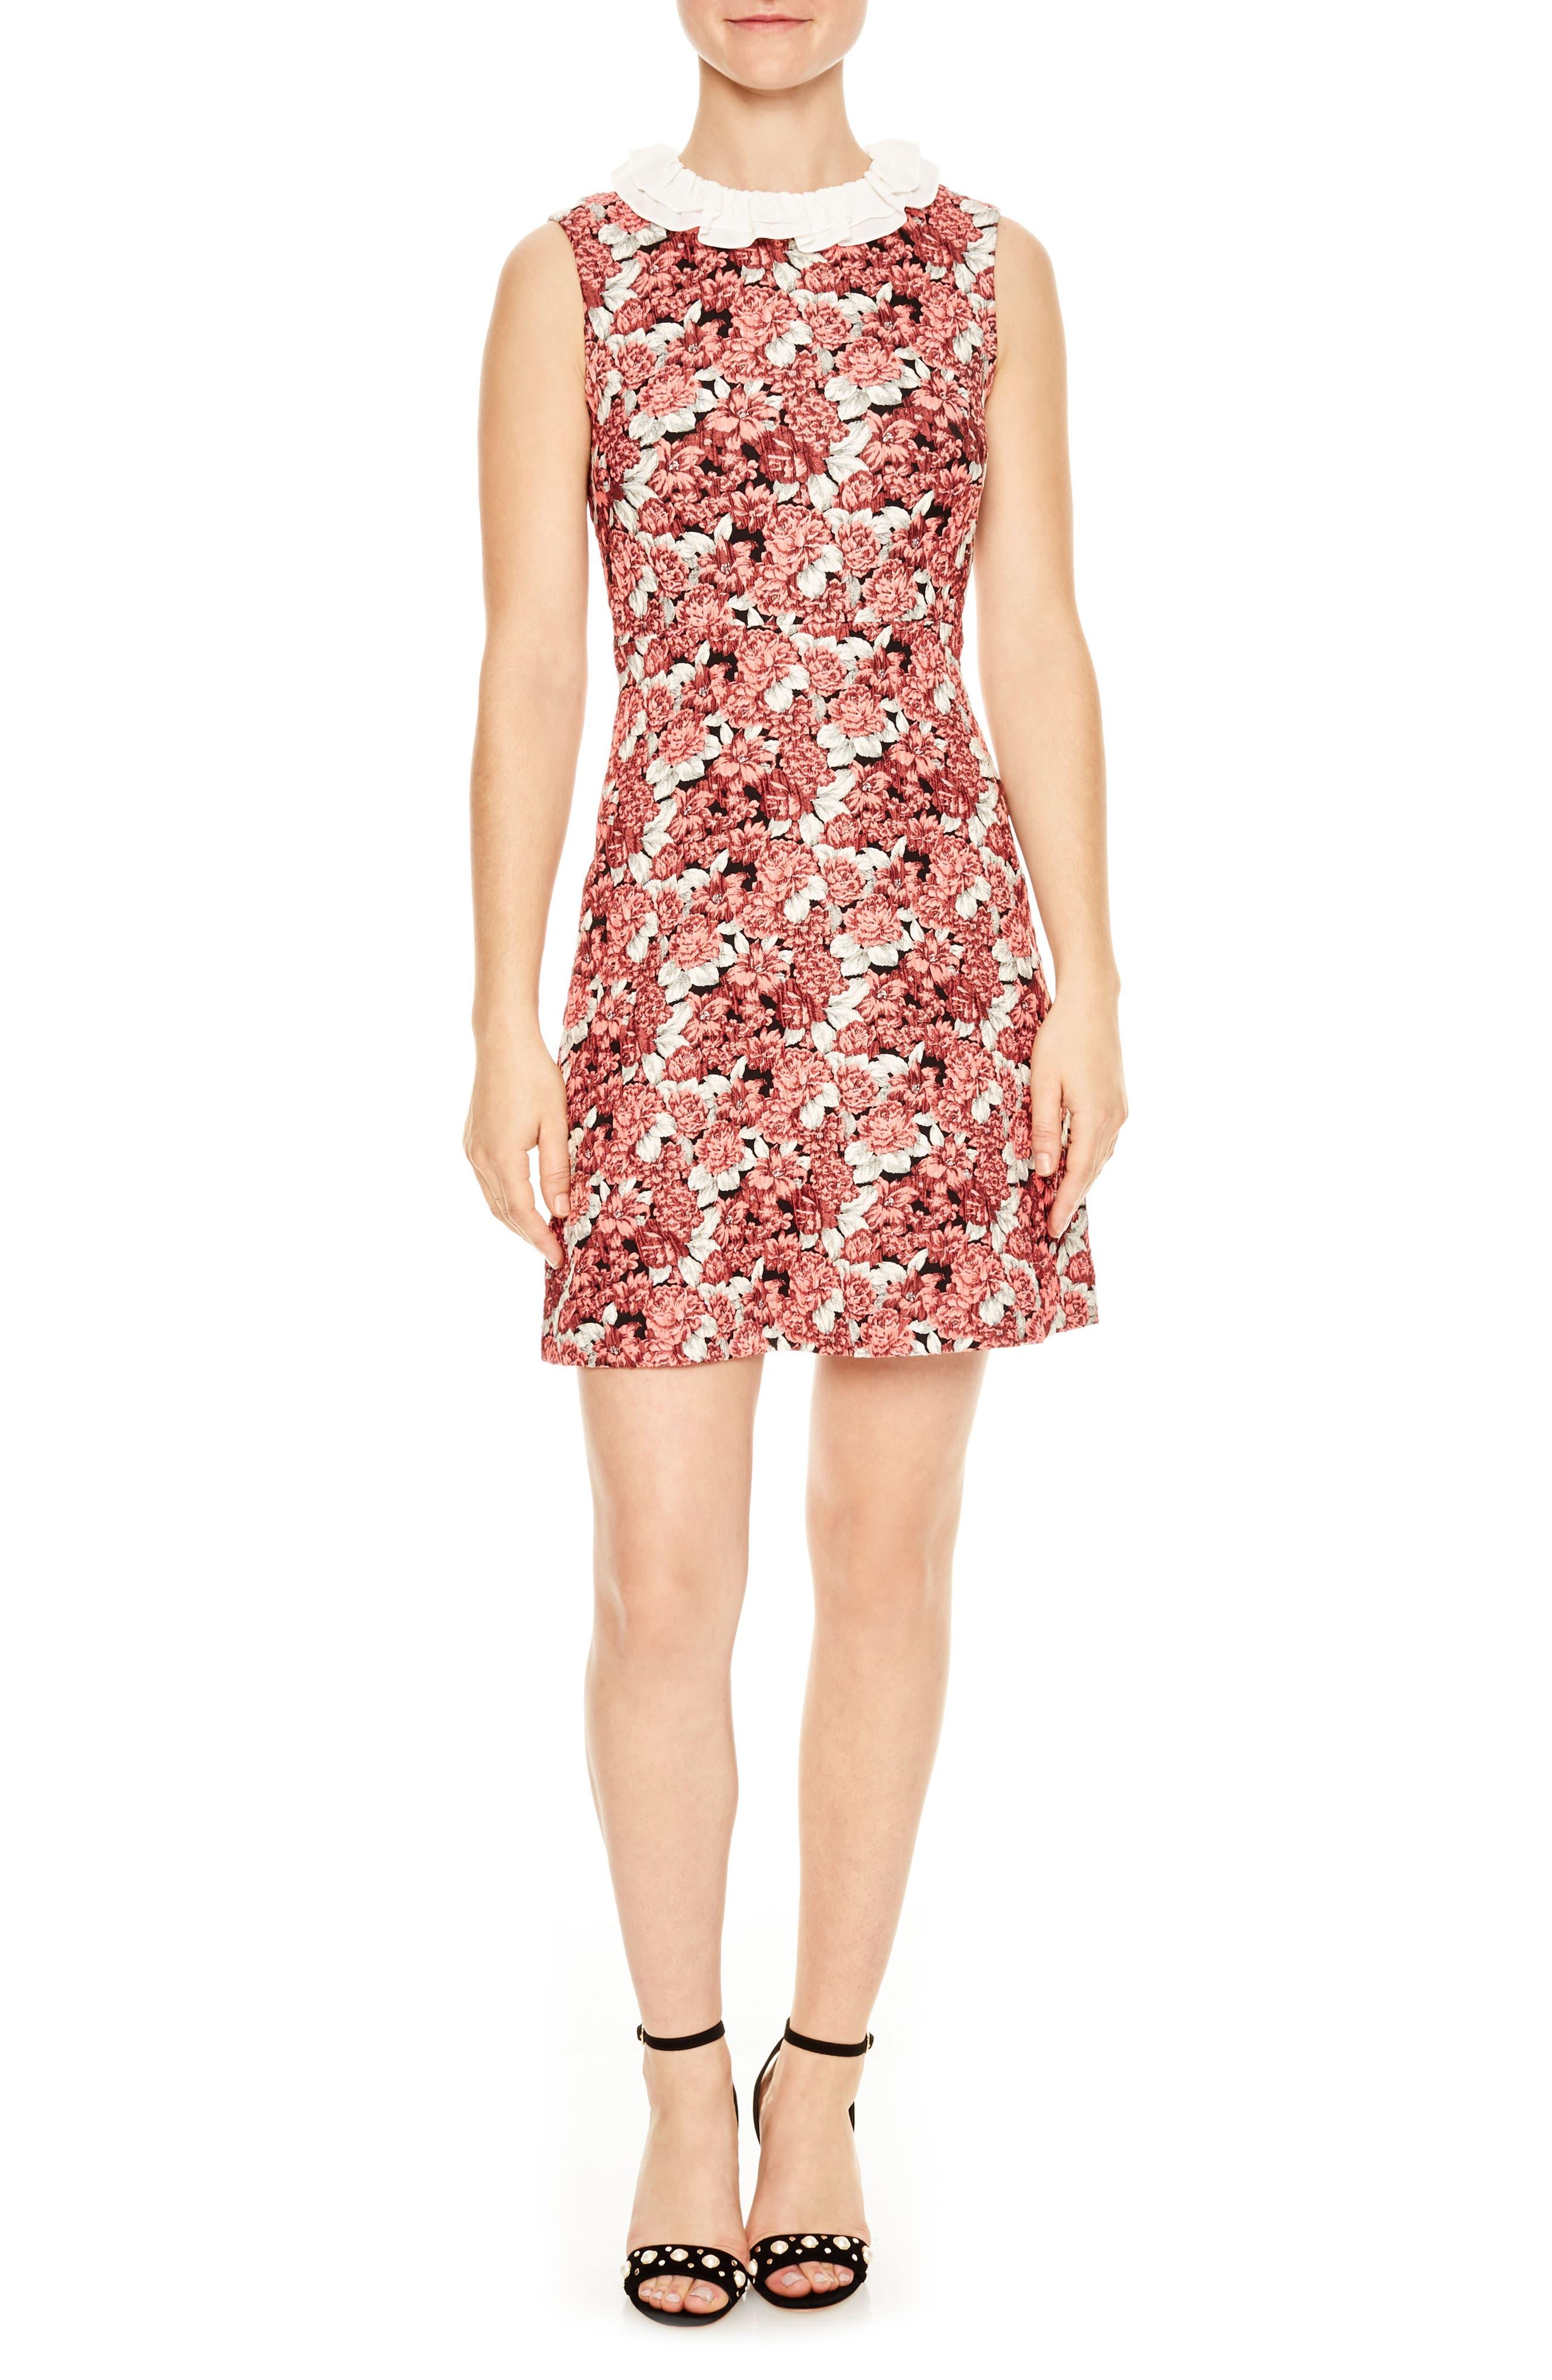 Edwige Floral Print Sheath Dress,                         Main,                         color, Pink